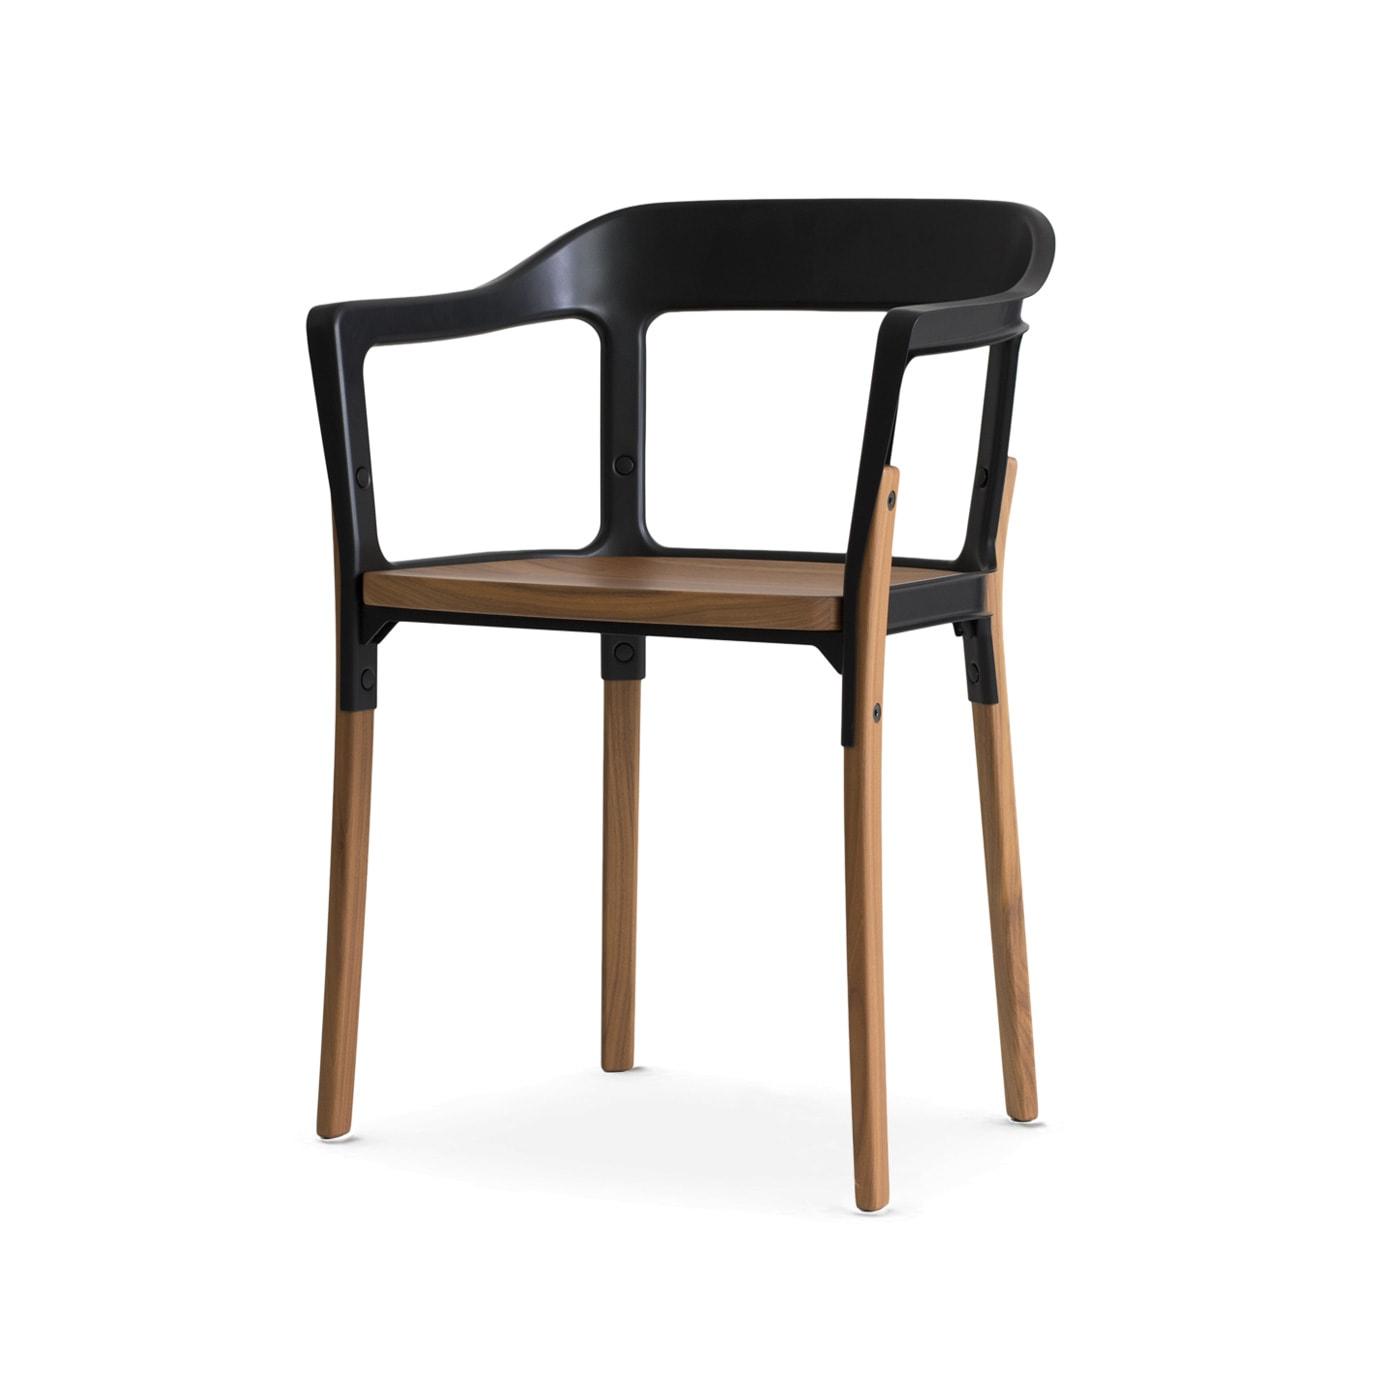 MAGIS Steelwood sedia gambe legno